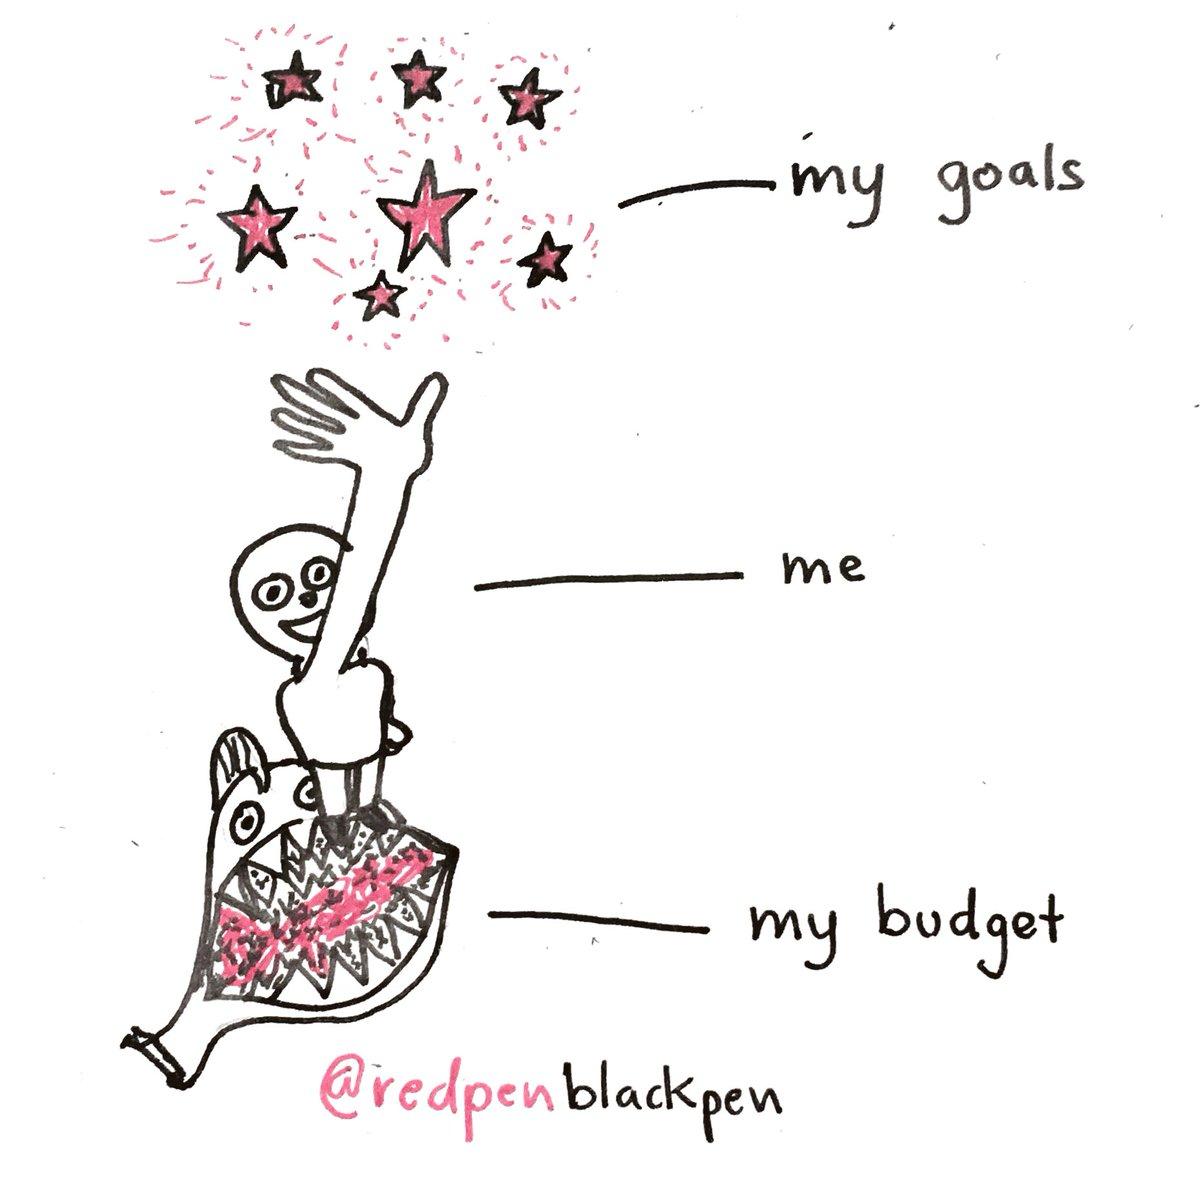 Living the life! #academia #funding<br>http://pic.twitter.com/o6o1Wb6PRz